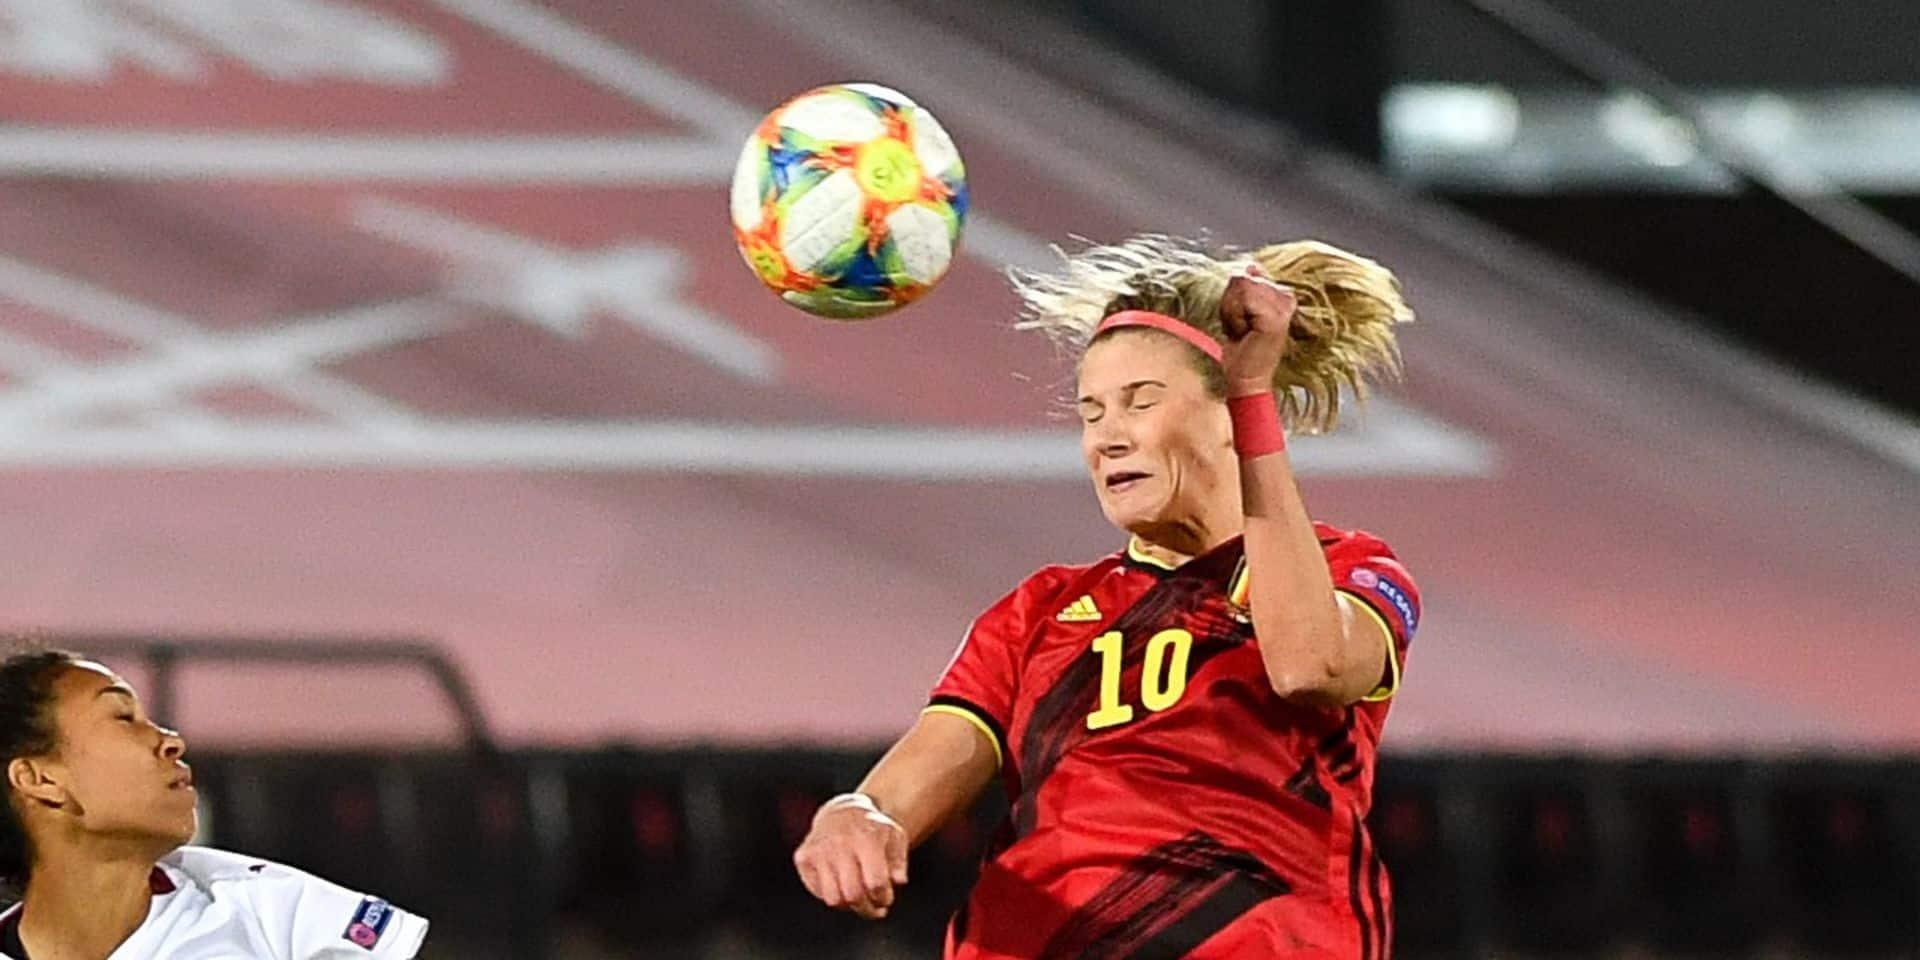 Justine Vanhaevermaet ne jouera pas contre l'Espagne et le Luxembourg